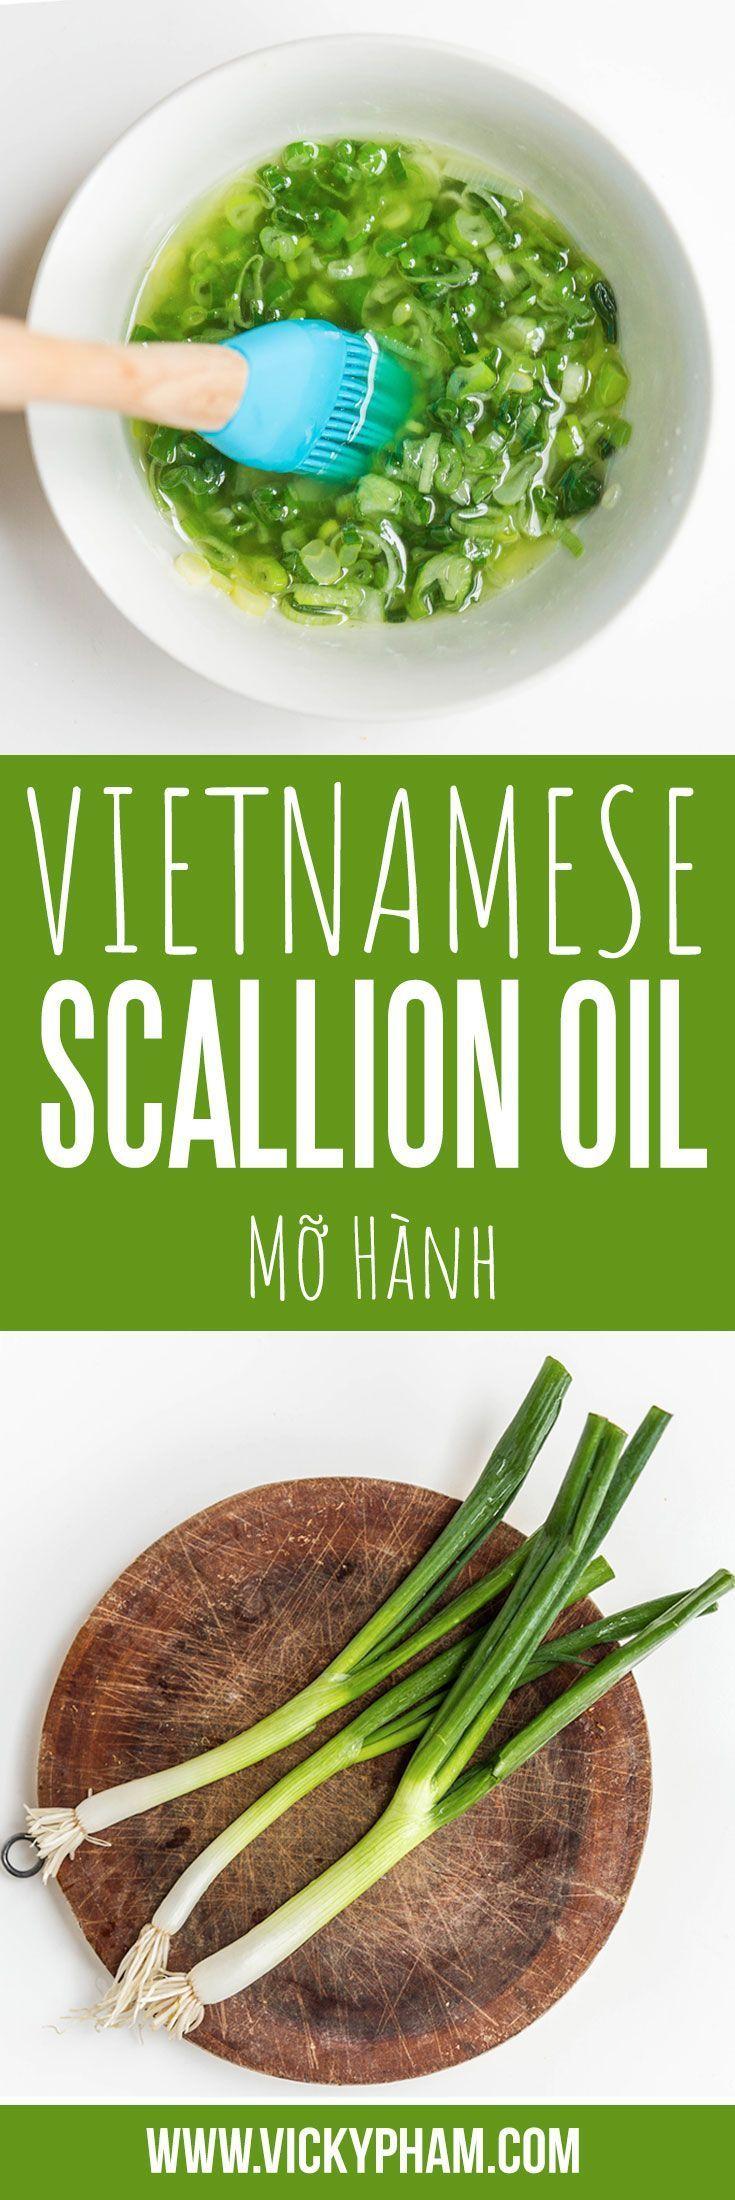 Vietnamese Scallion Oil (Mo Hanh) Recipe Vietnamese